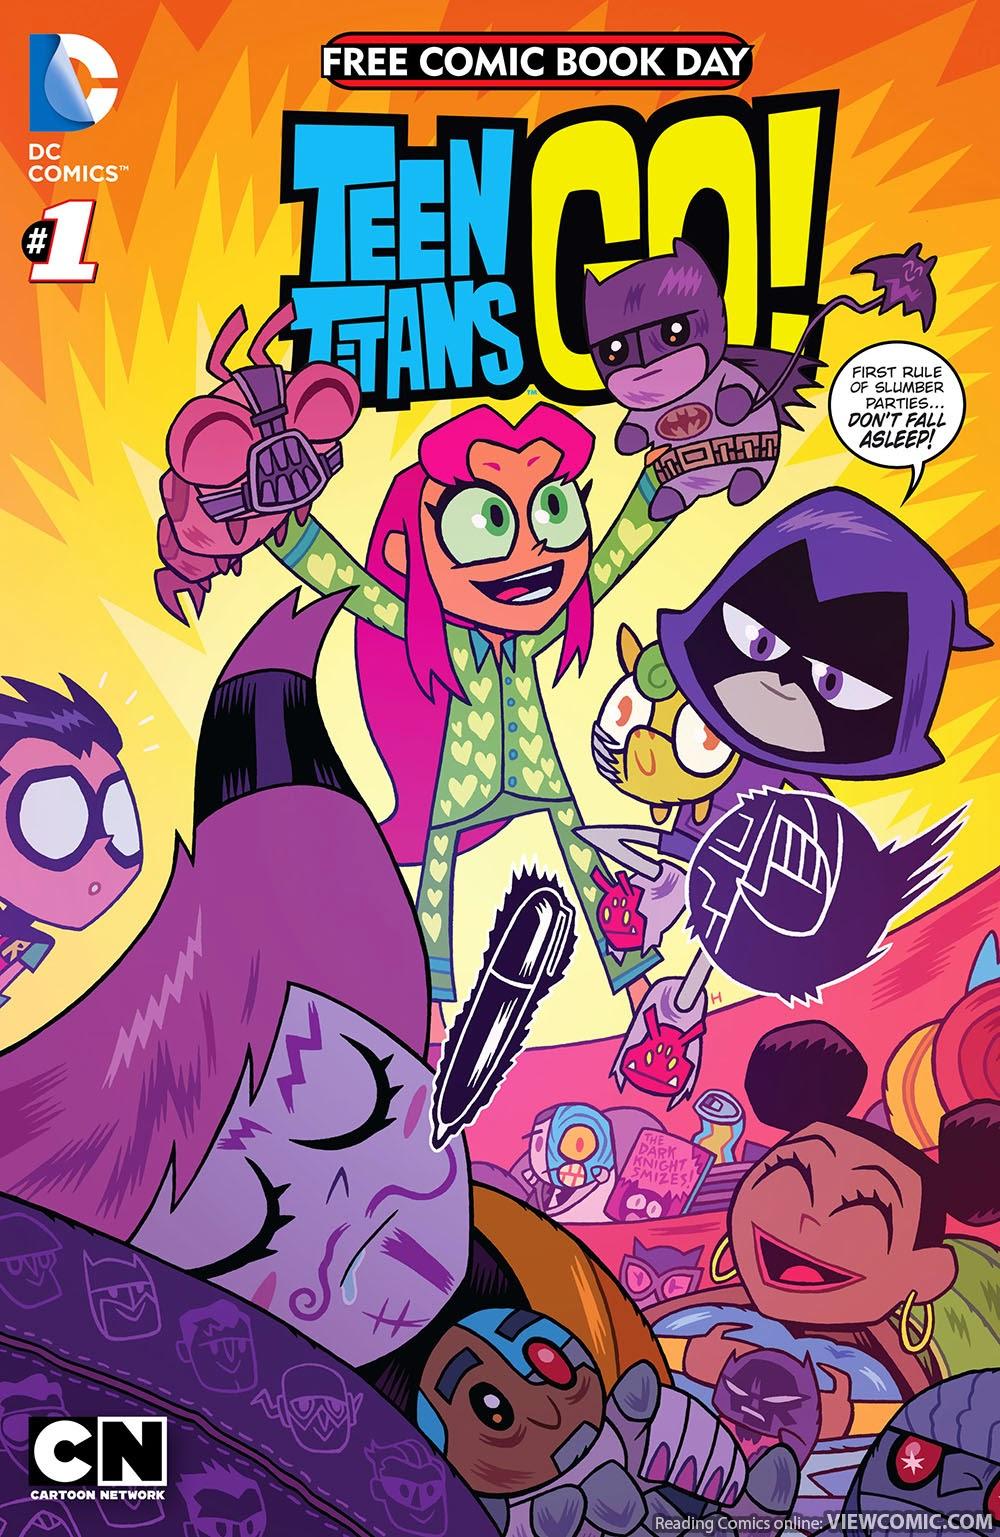 Free Read Sex Comic free comic book day 2015 – teen titans go!-scooby-doo team